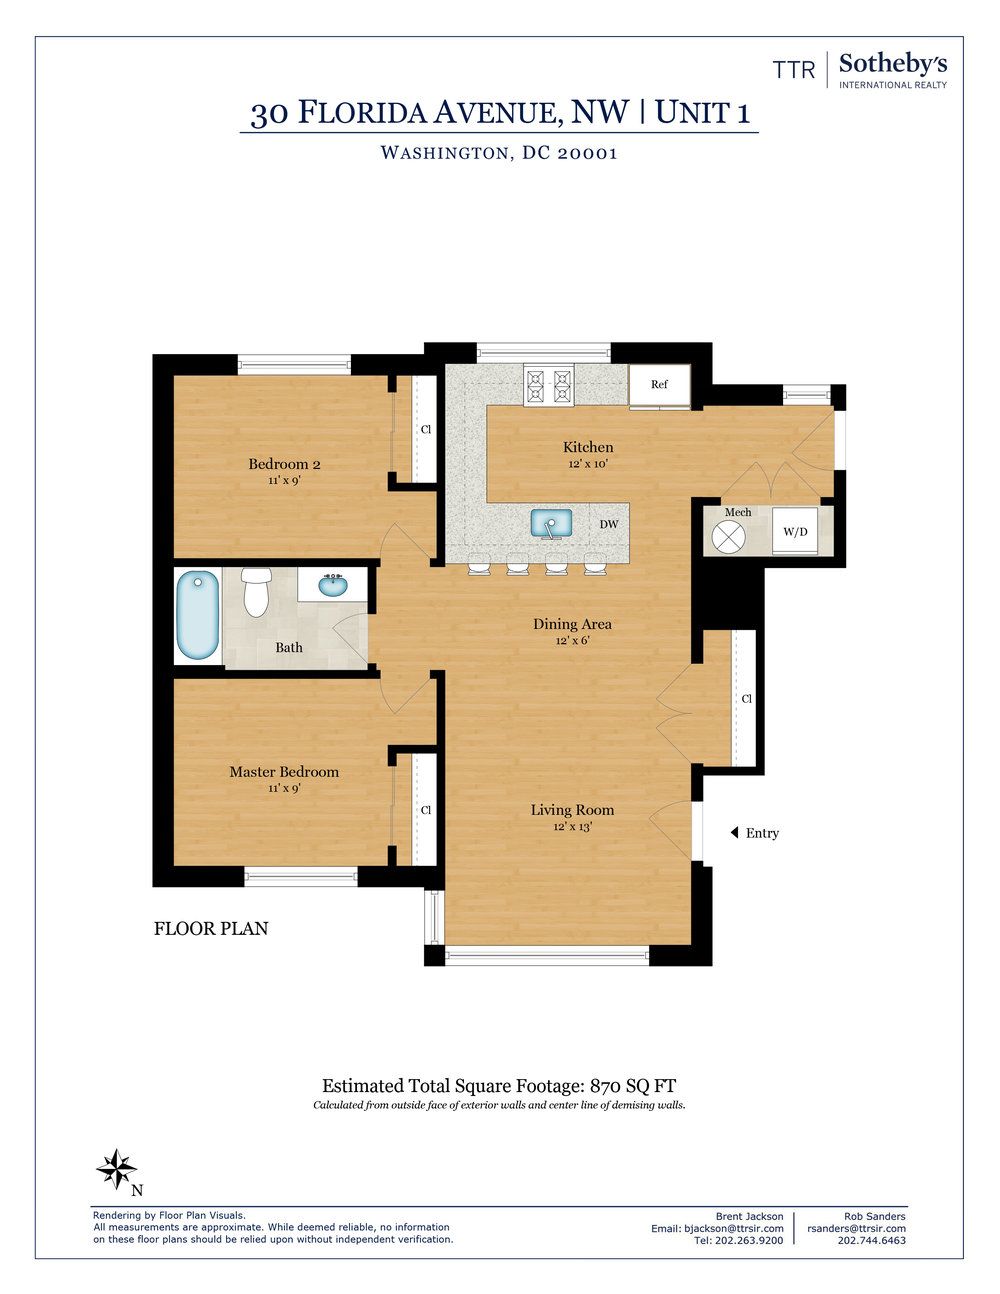 BJ-30FloridaAveNW#1-FloorPlan-Print-R1.jpg